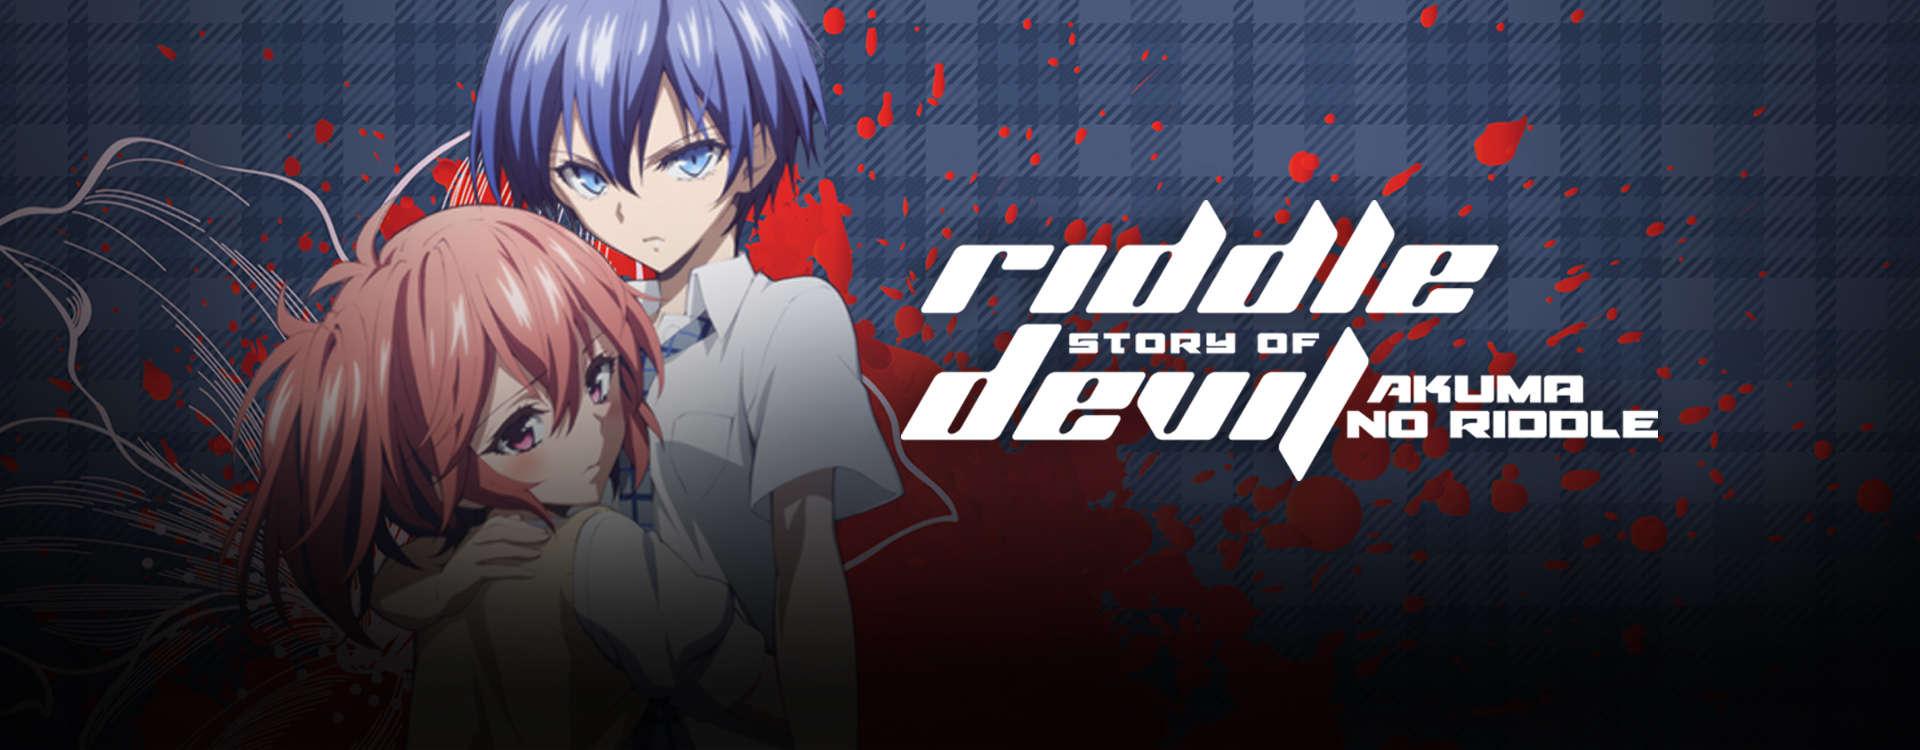 Riddle Story of Devil